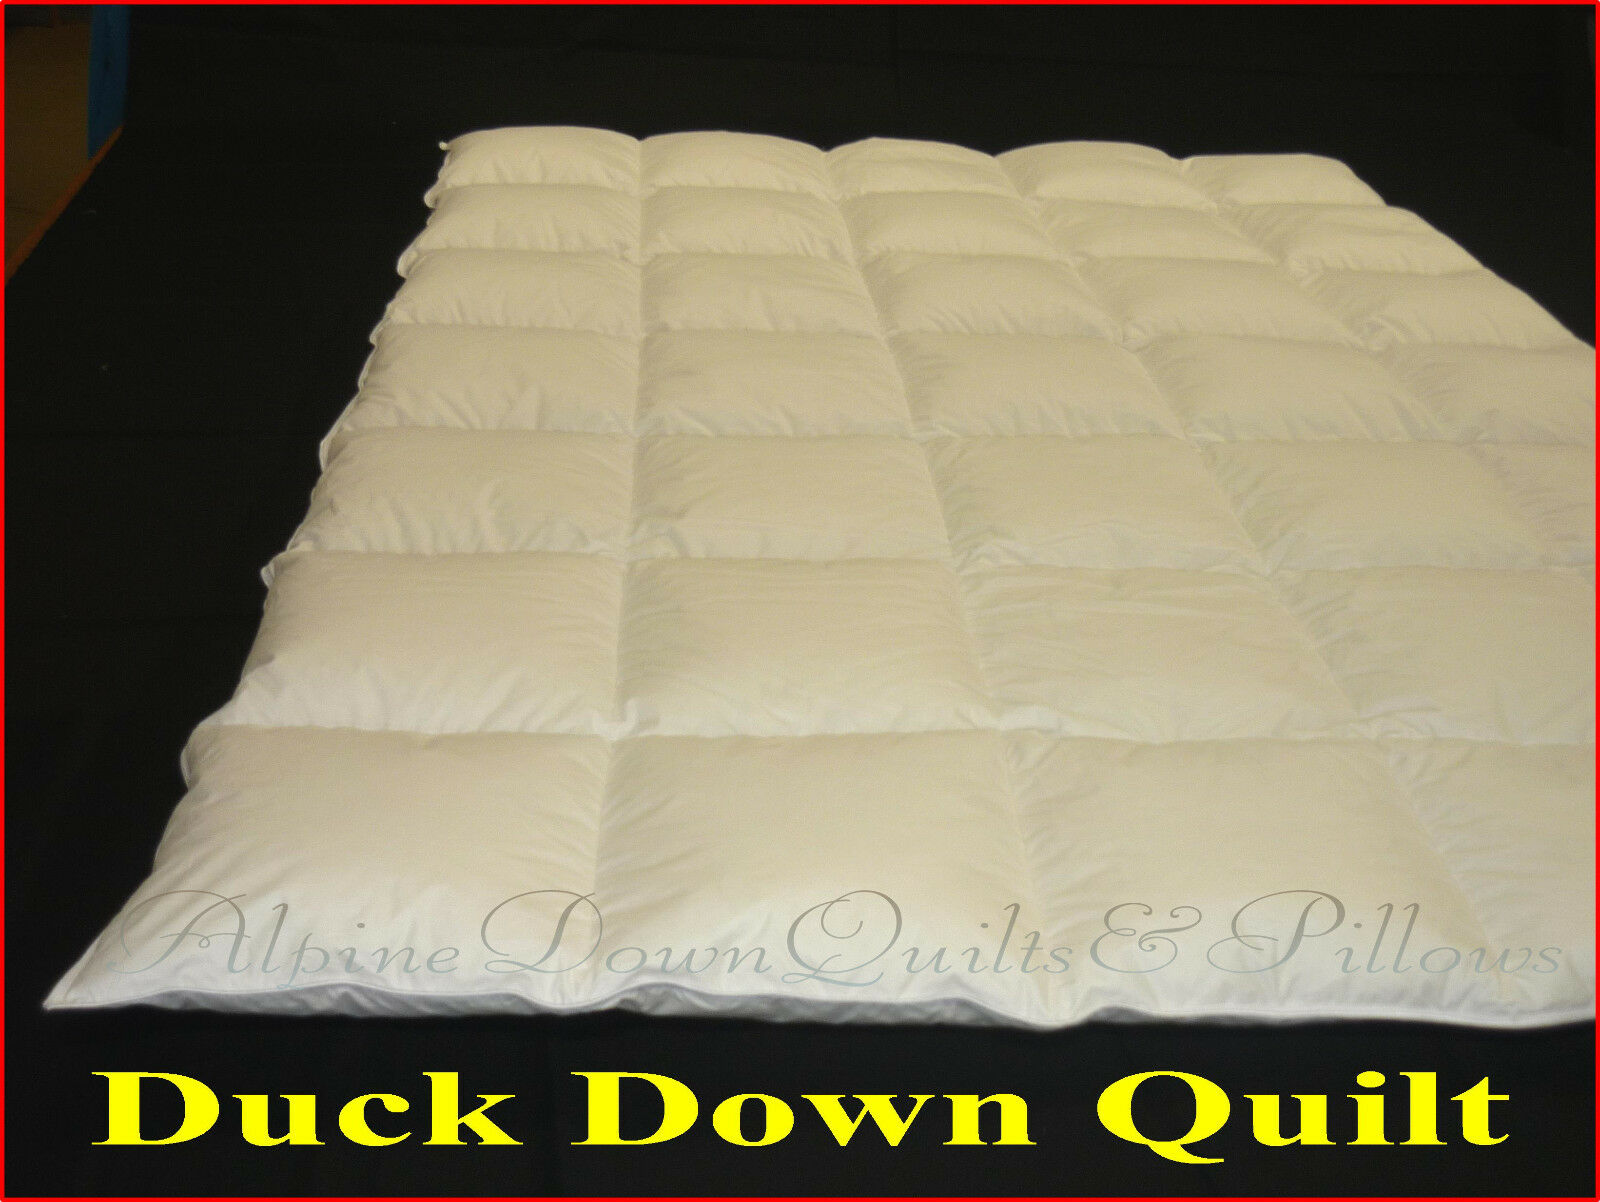 DUCK DOWN QUILT DOUBLE BED Größe -  7 BLANKET 100% COTTON CASING AUSTRALIAN MADE